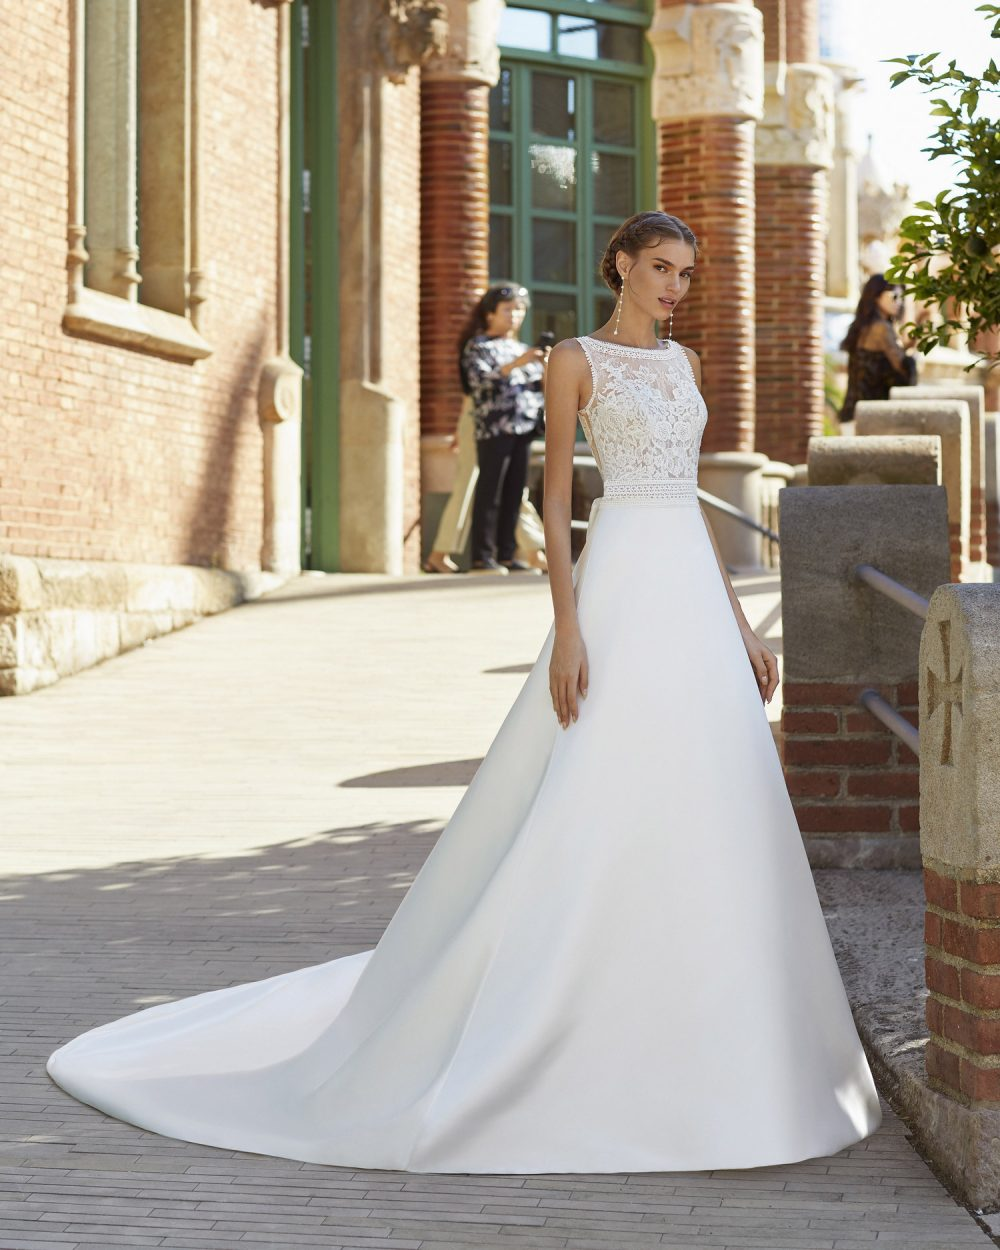 Mariages: abito da sposa Rosa Clarà 2021 a Vicenza, Verona, Padova, Veneto 5S159 YUKA